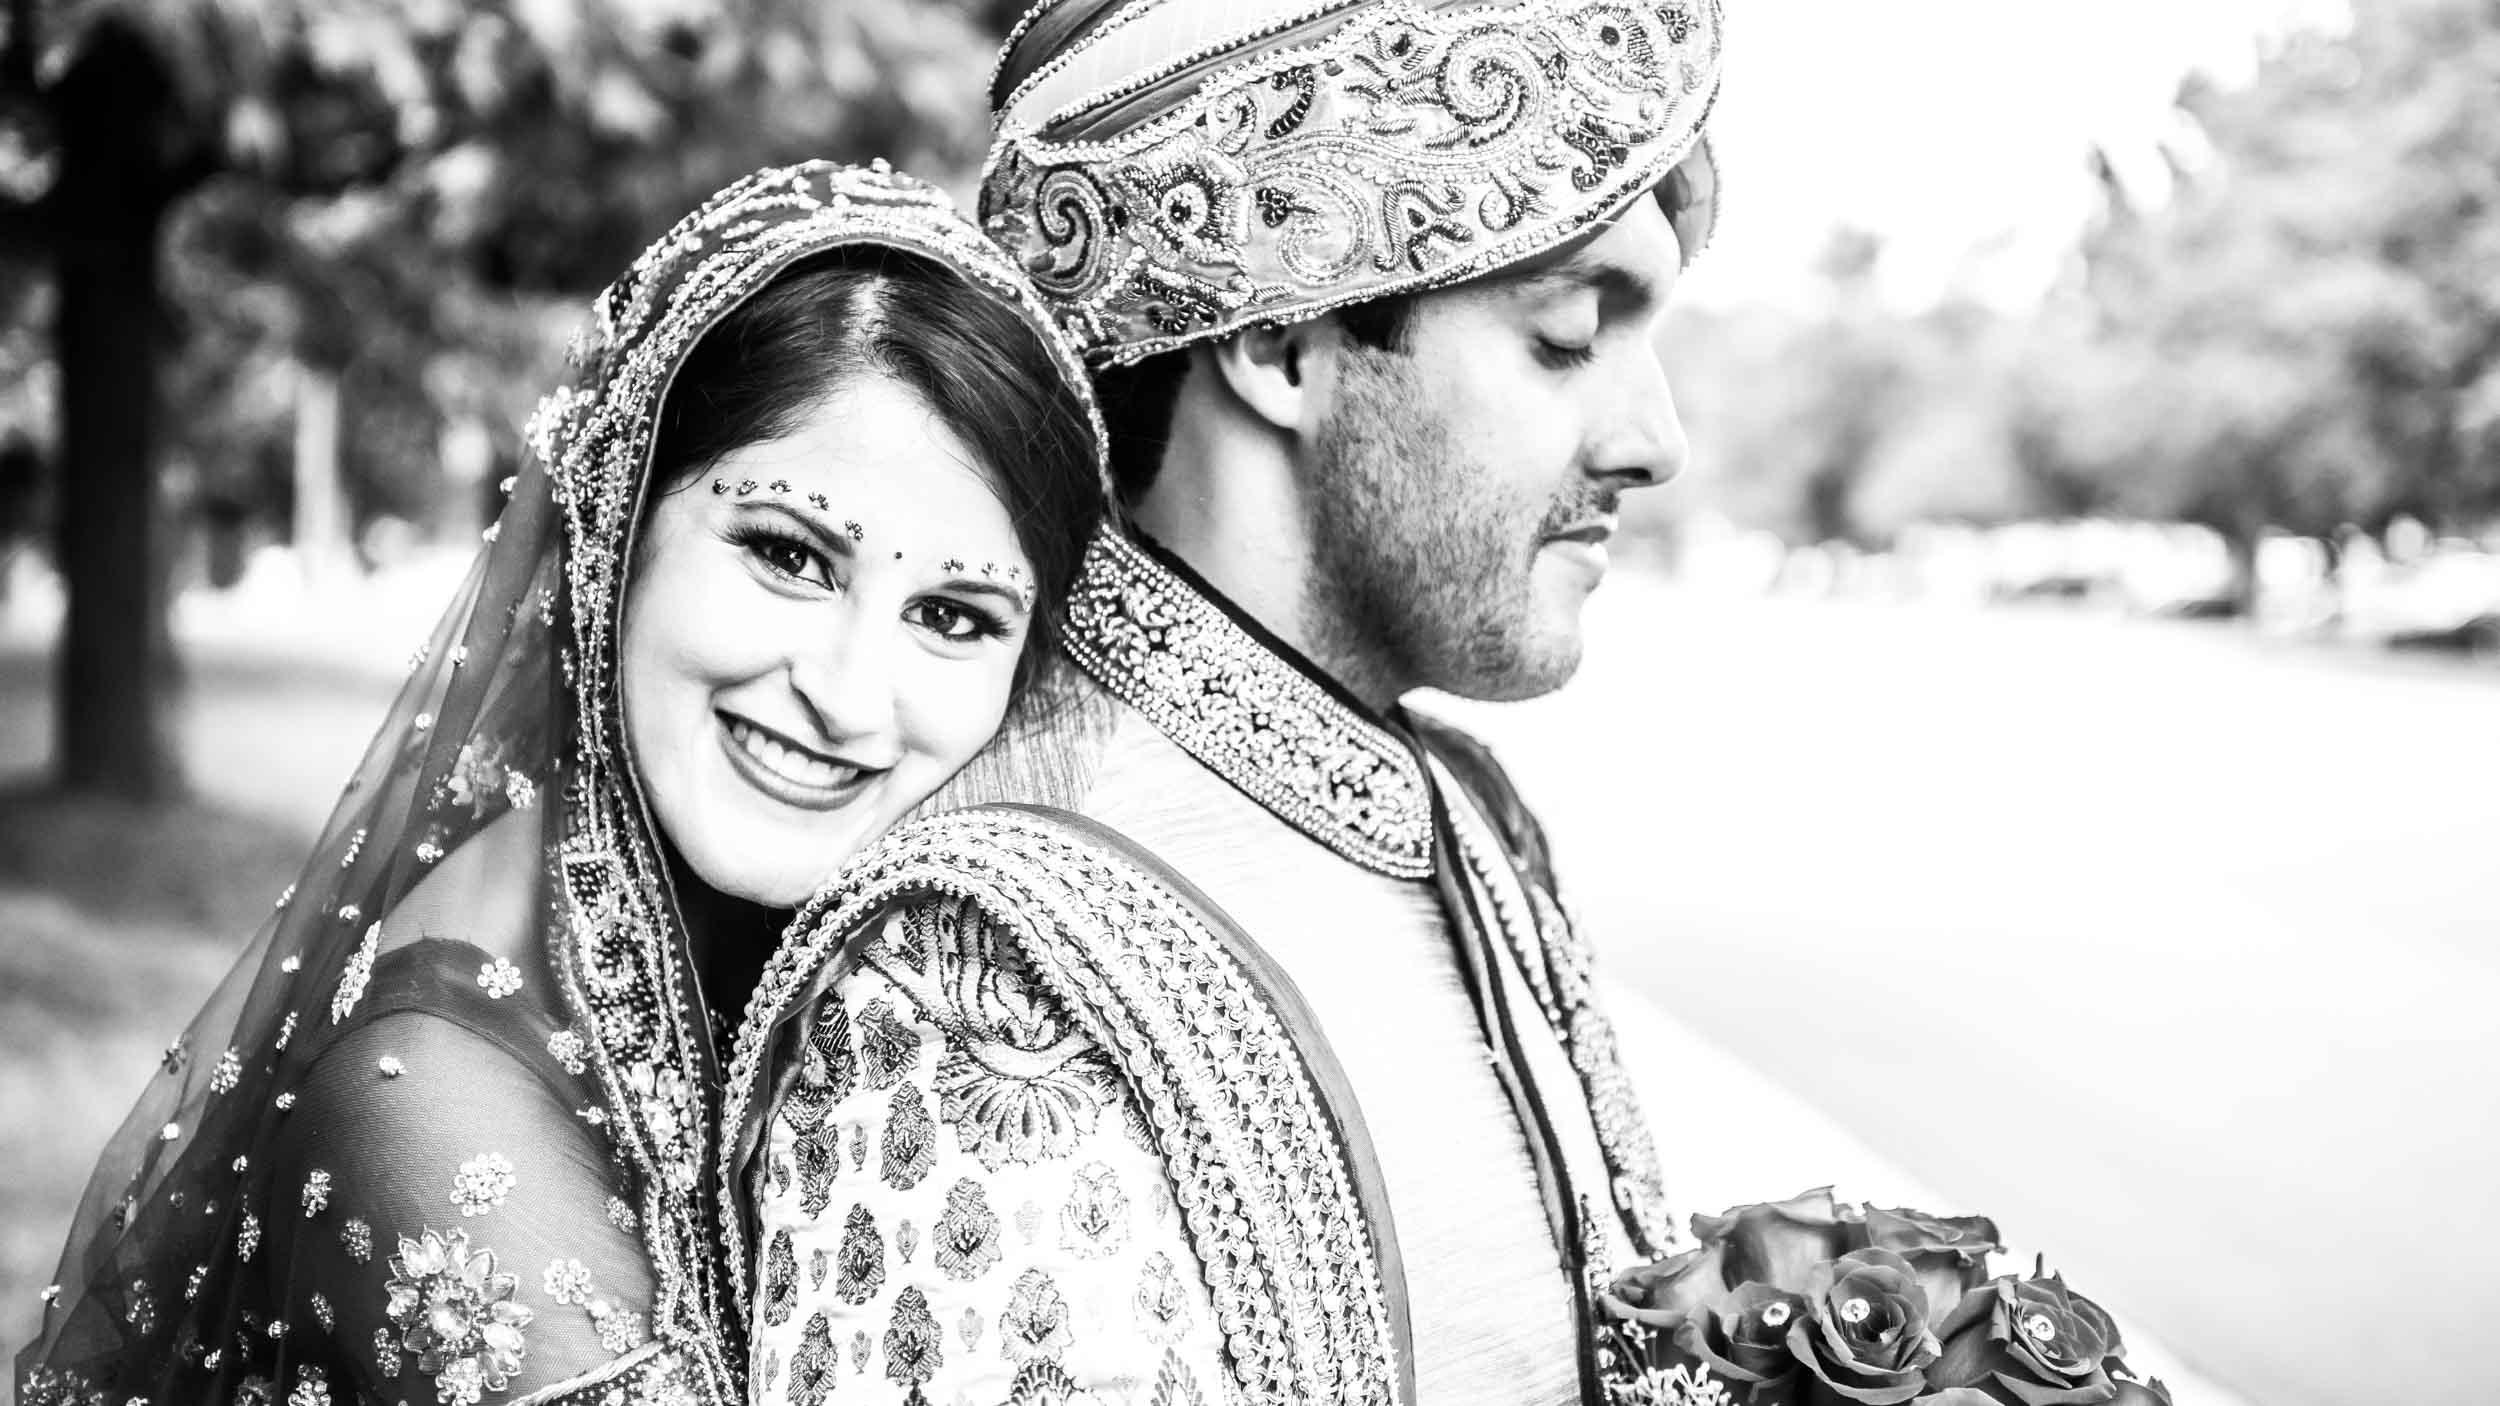 dc+metro+wedding+photographer+vadym+guliuk+photography+wedding+bride+and+groom-2041.jpg